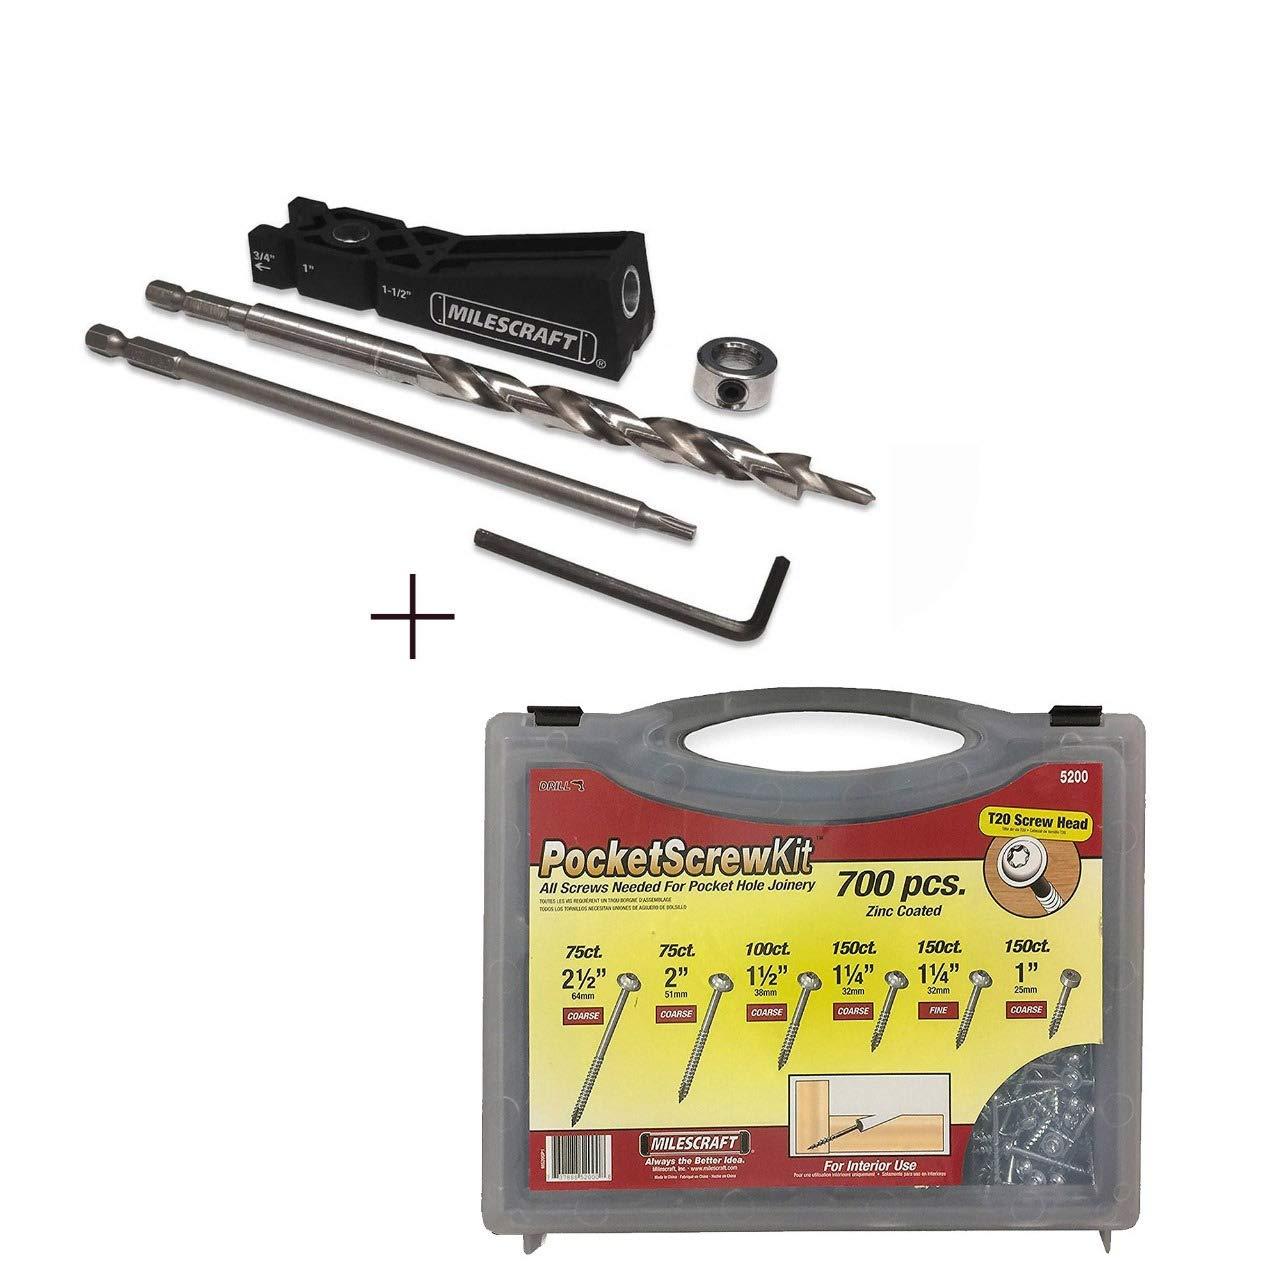 Milescraft Pocket Hole Jig Bundle - Includes One Milescraft PocketJig 100 + One Milescraft PocketScrewKit 700 pcs + Carrying Case